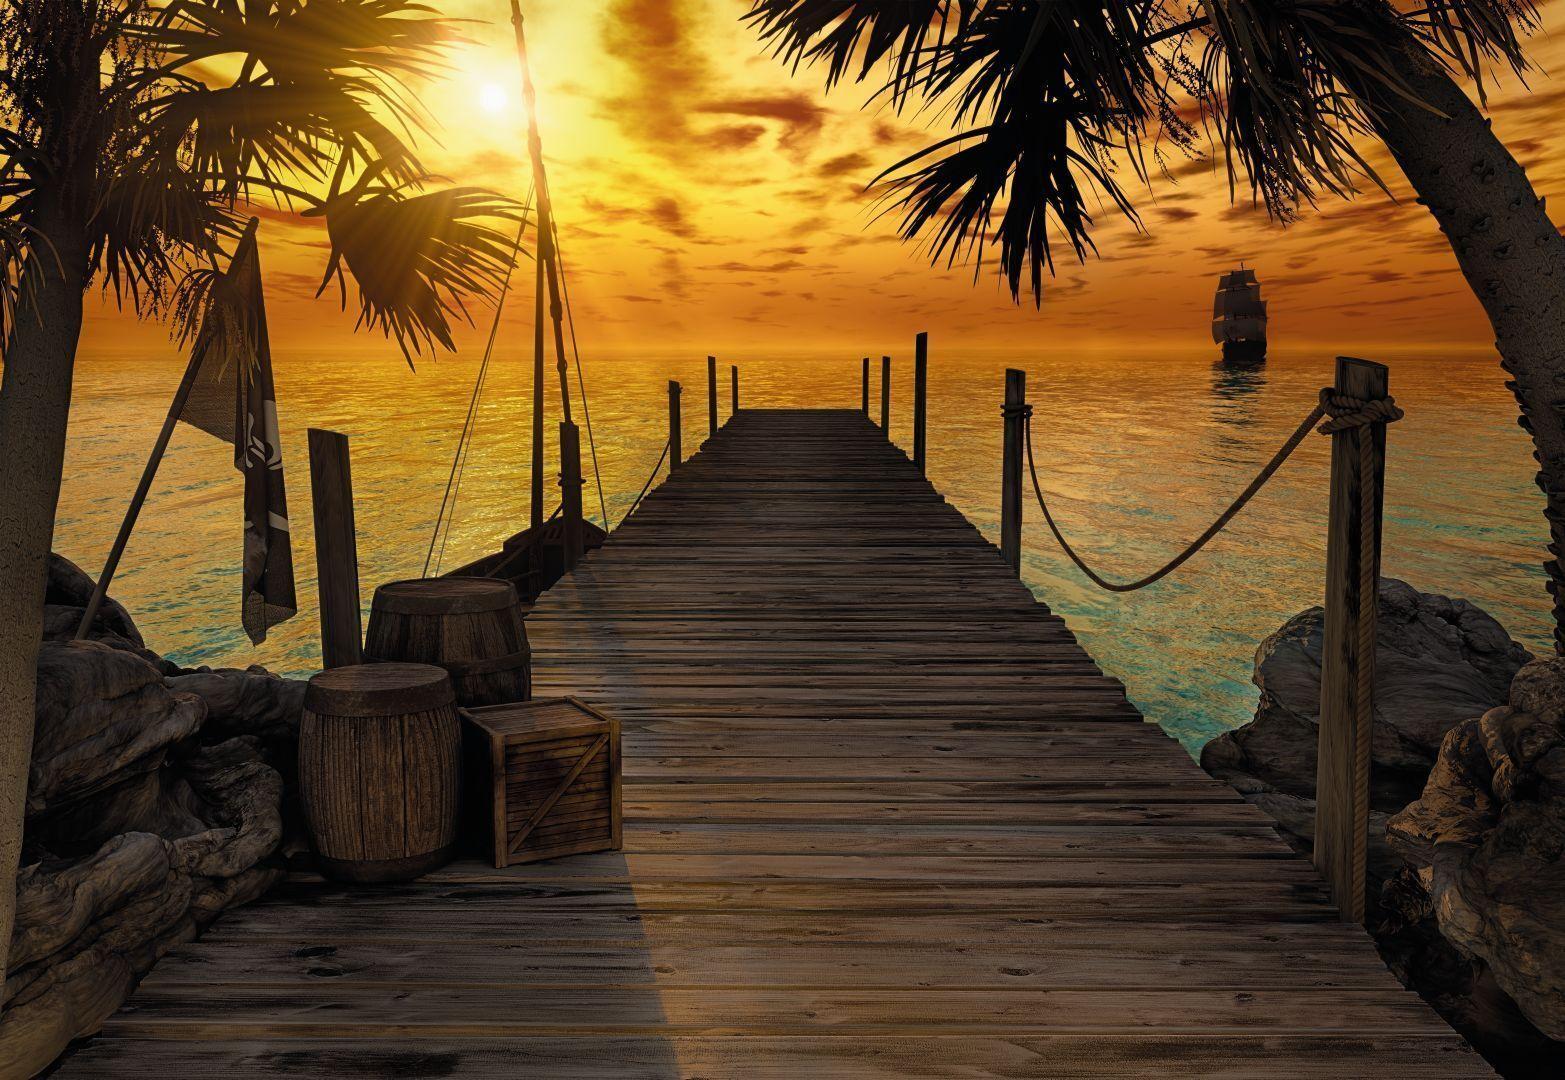 Riesiges Fototapete Wandtapete 368x254cm Tropische Insel